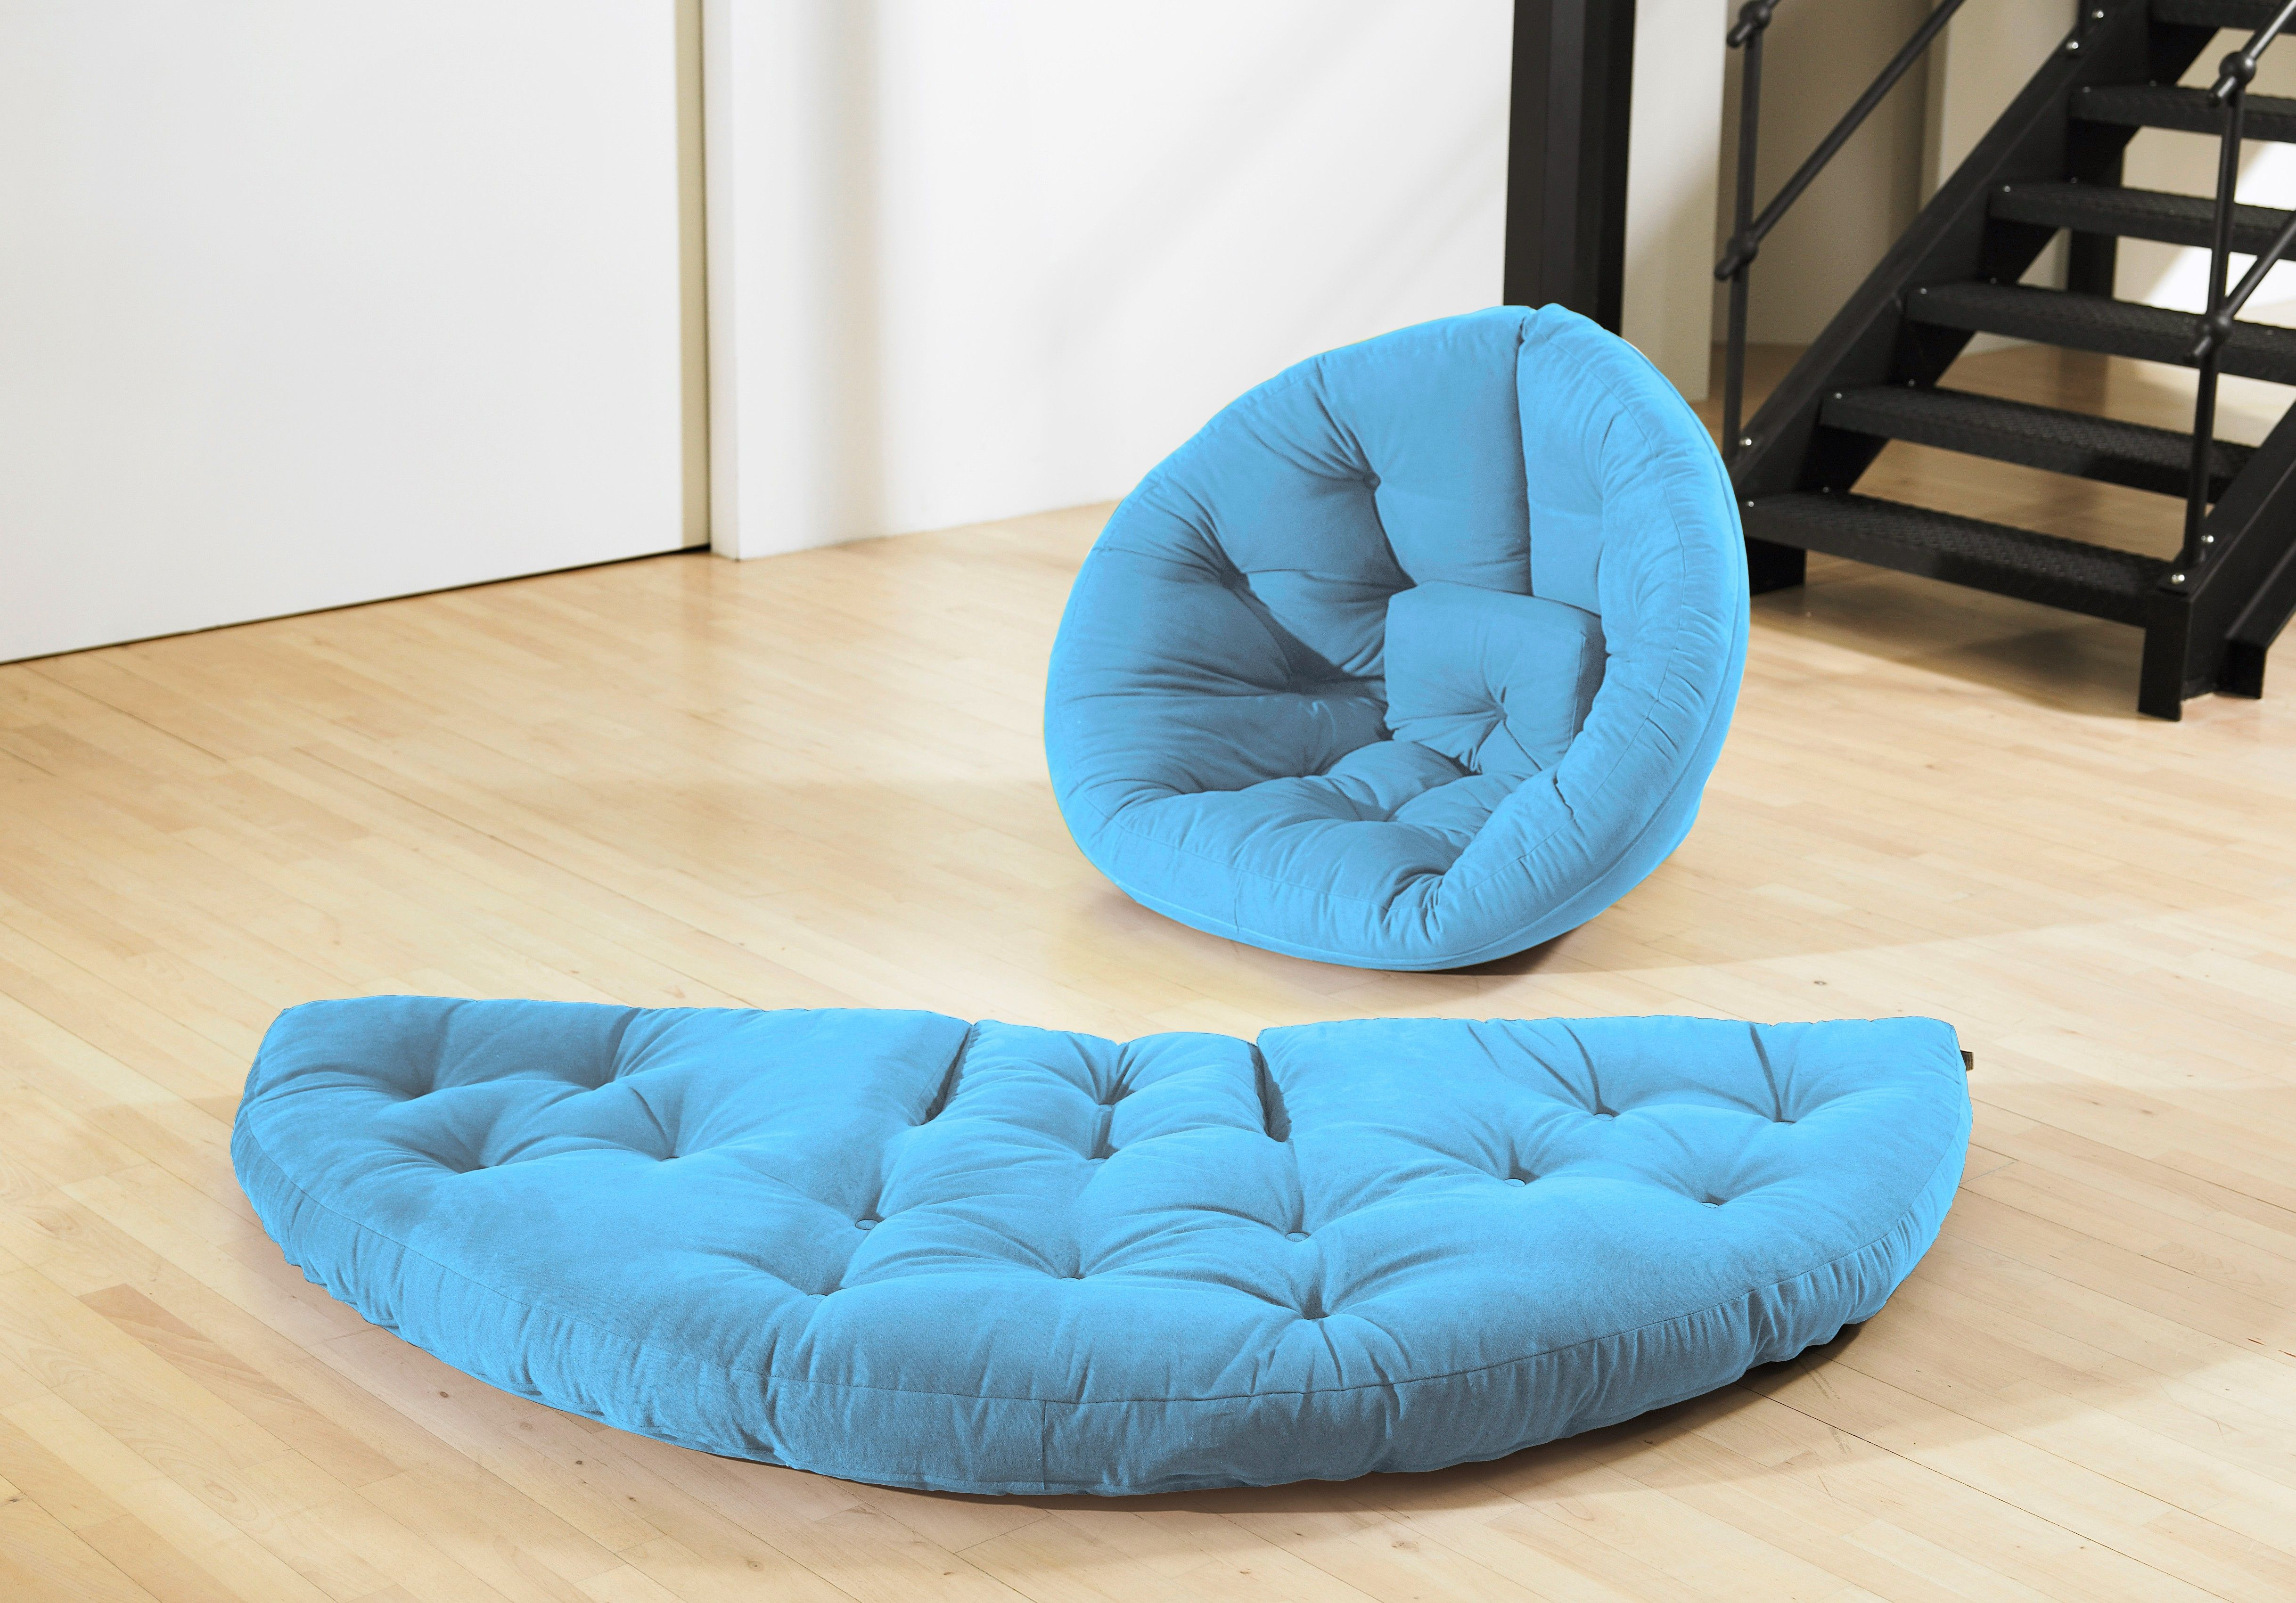 Poltrona Letto Futon : Poltrona letto futon nido karup poltrone room